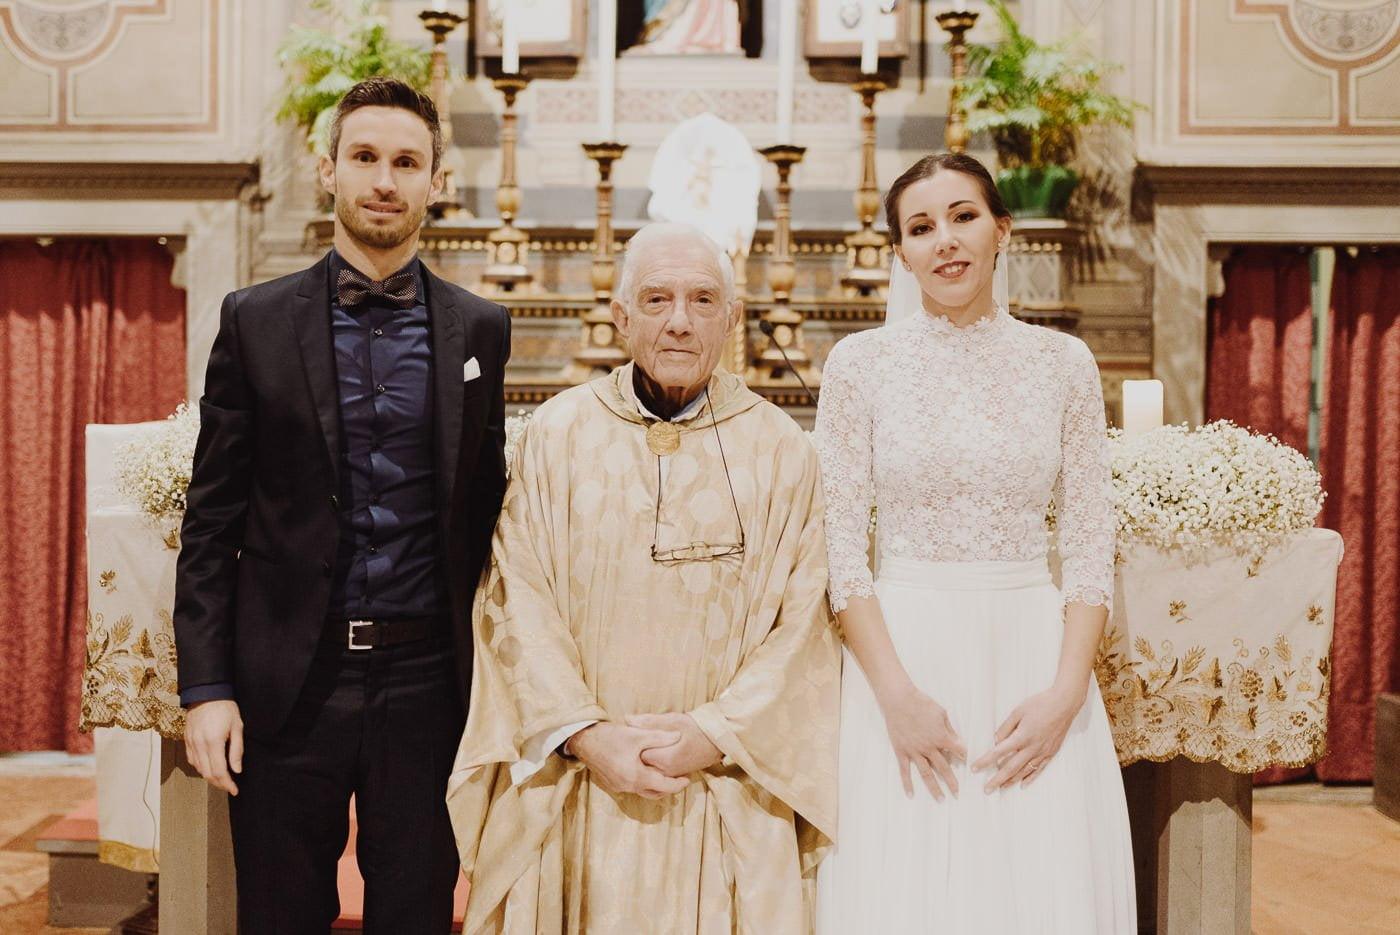 Matrimonio Giulia & Alessandro 28_12 – Alessio Nobili Photographer-27